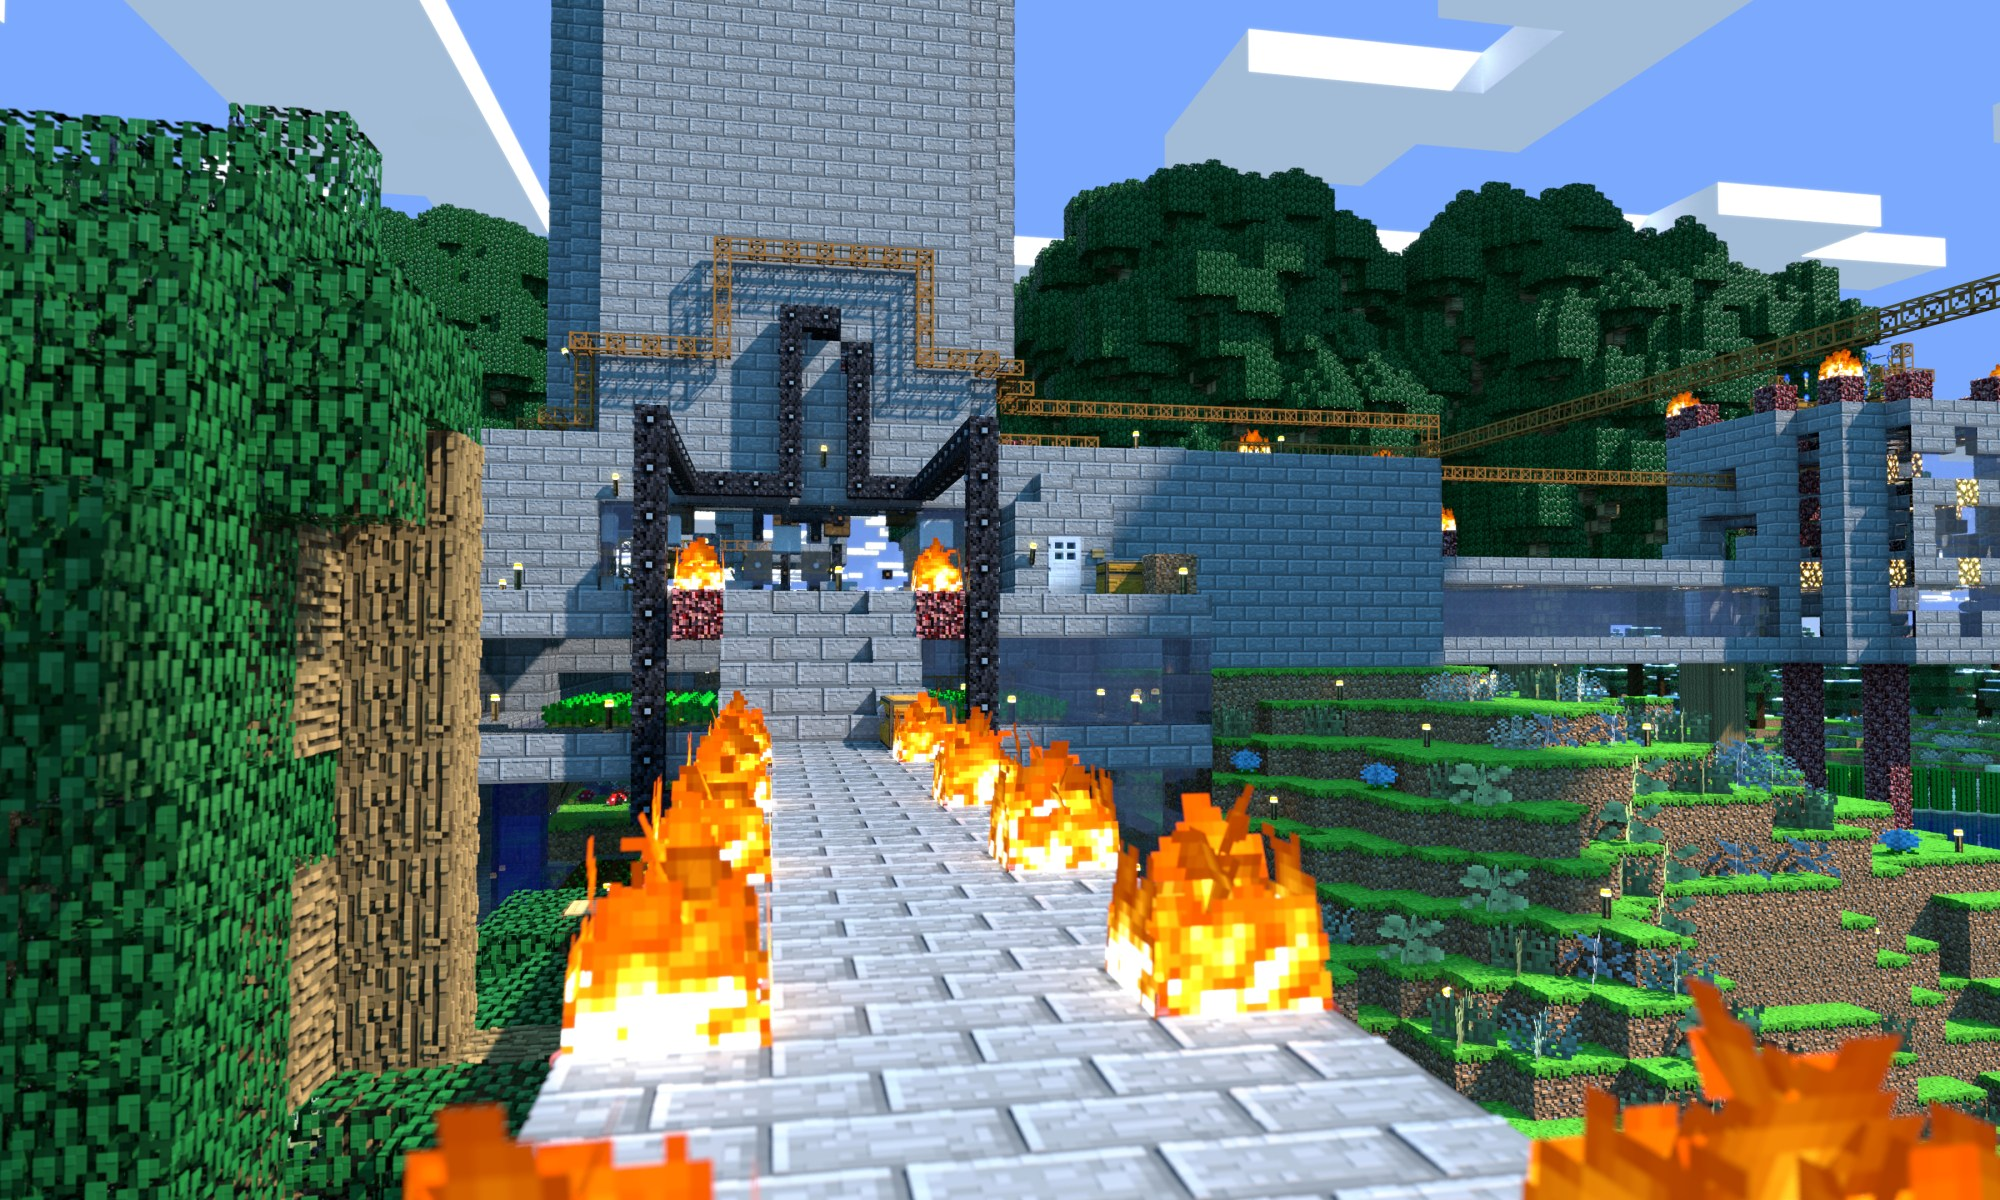 Minecraft Tower Rear 3D Render Wallpaper